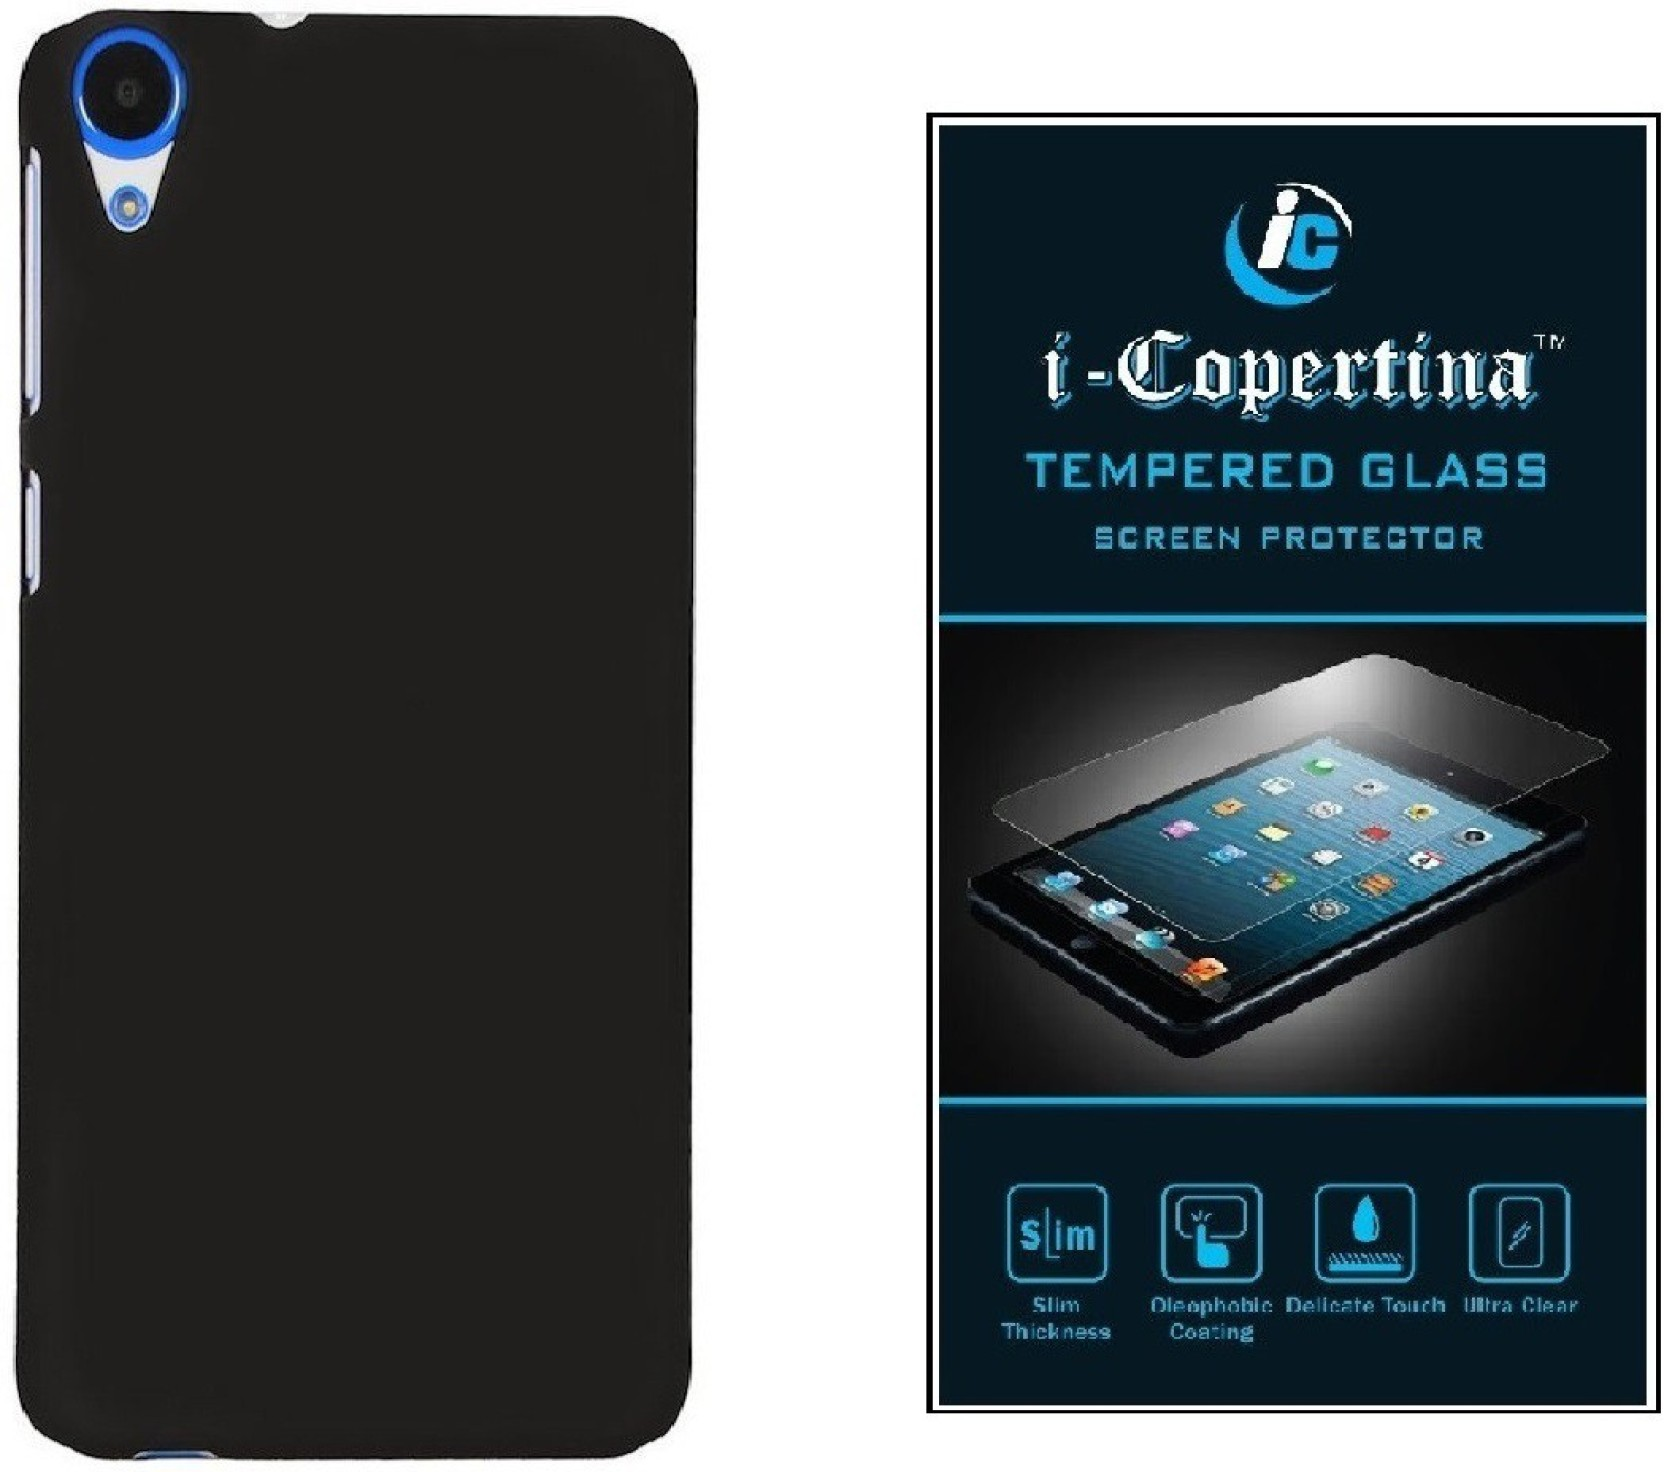 icopertina cover accessory combo for oppo a37 oppo a37f price in india   buy icopertina cover